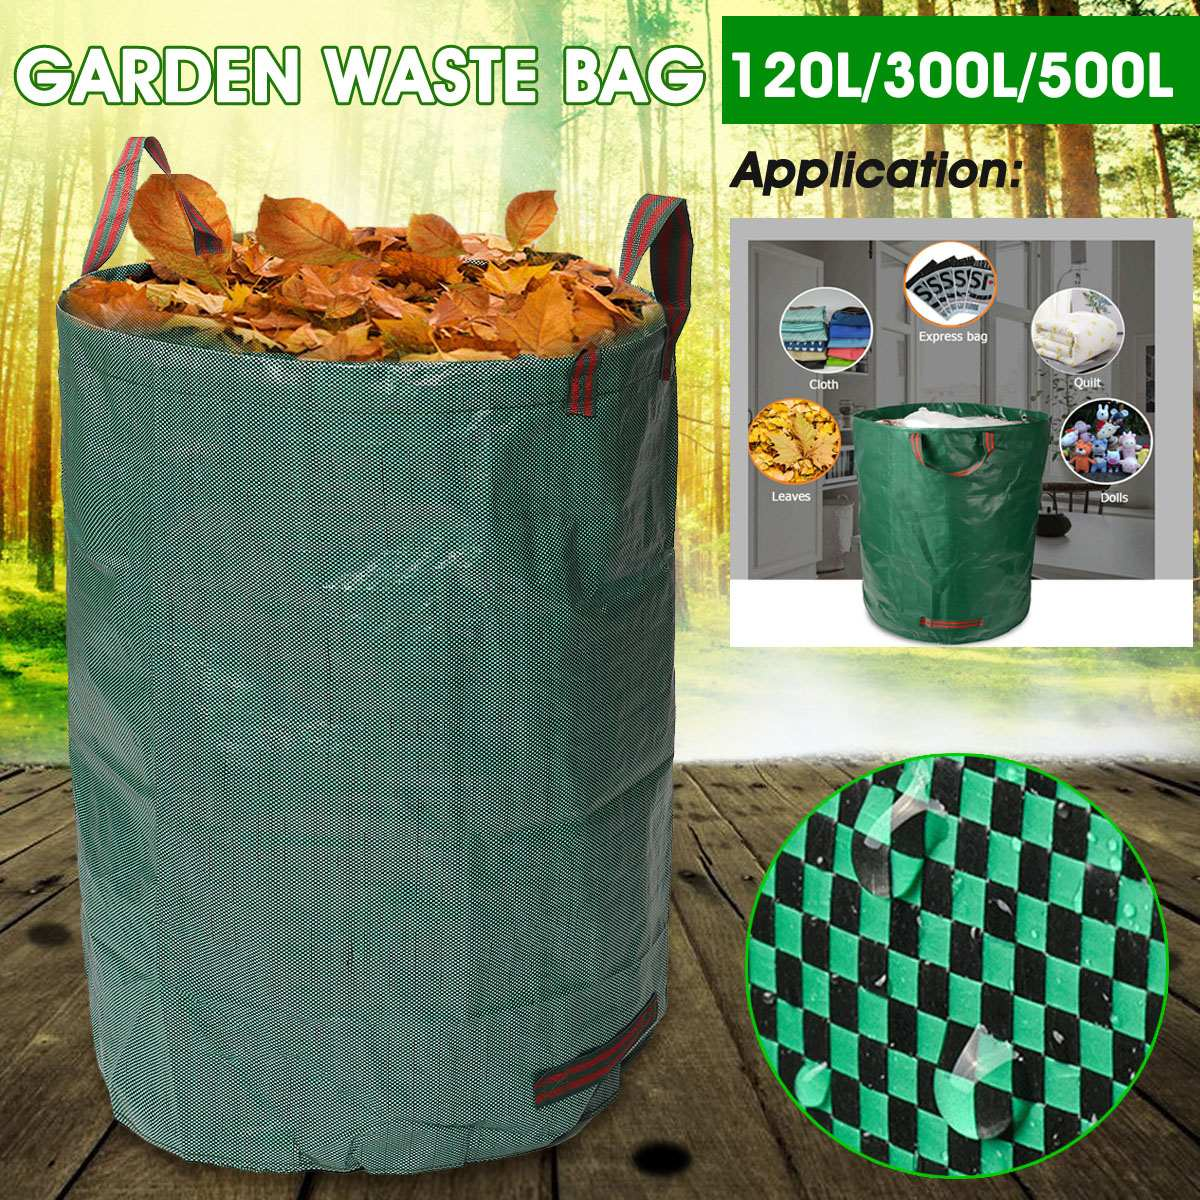 120l/300l/500l resíduos do jardim sacos recusar lixo grama grande titular saco caso saco resistente bin casa brinquedos armazenamento de roupas quintal